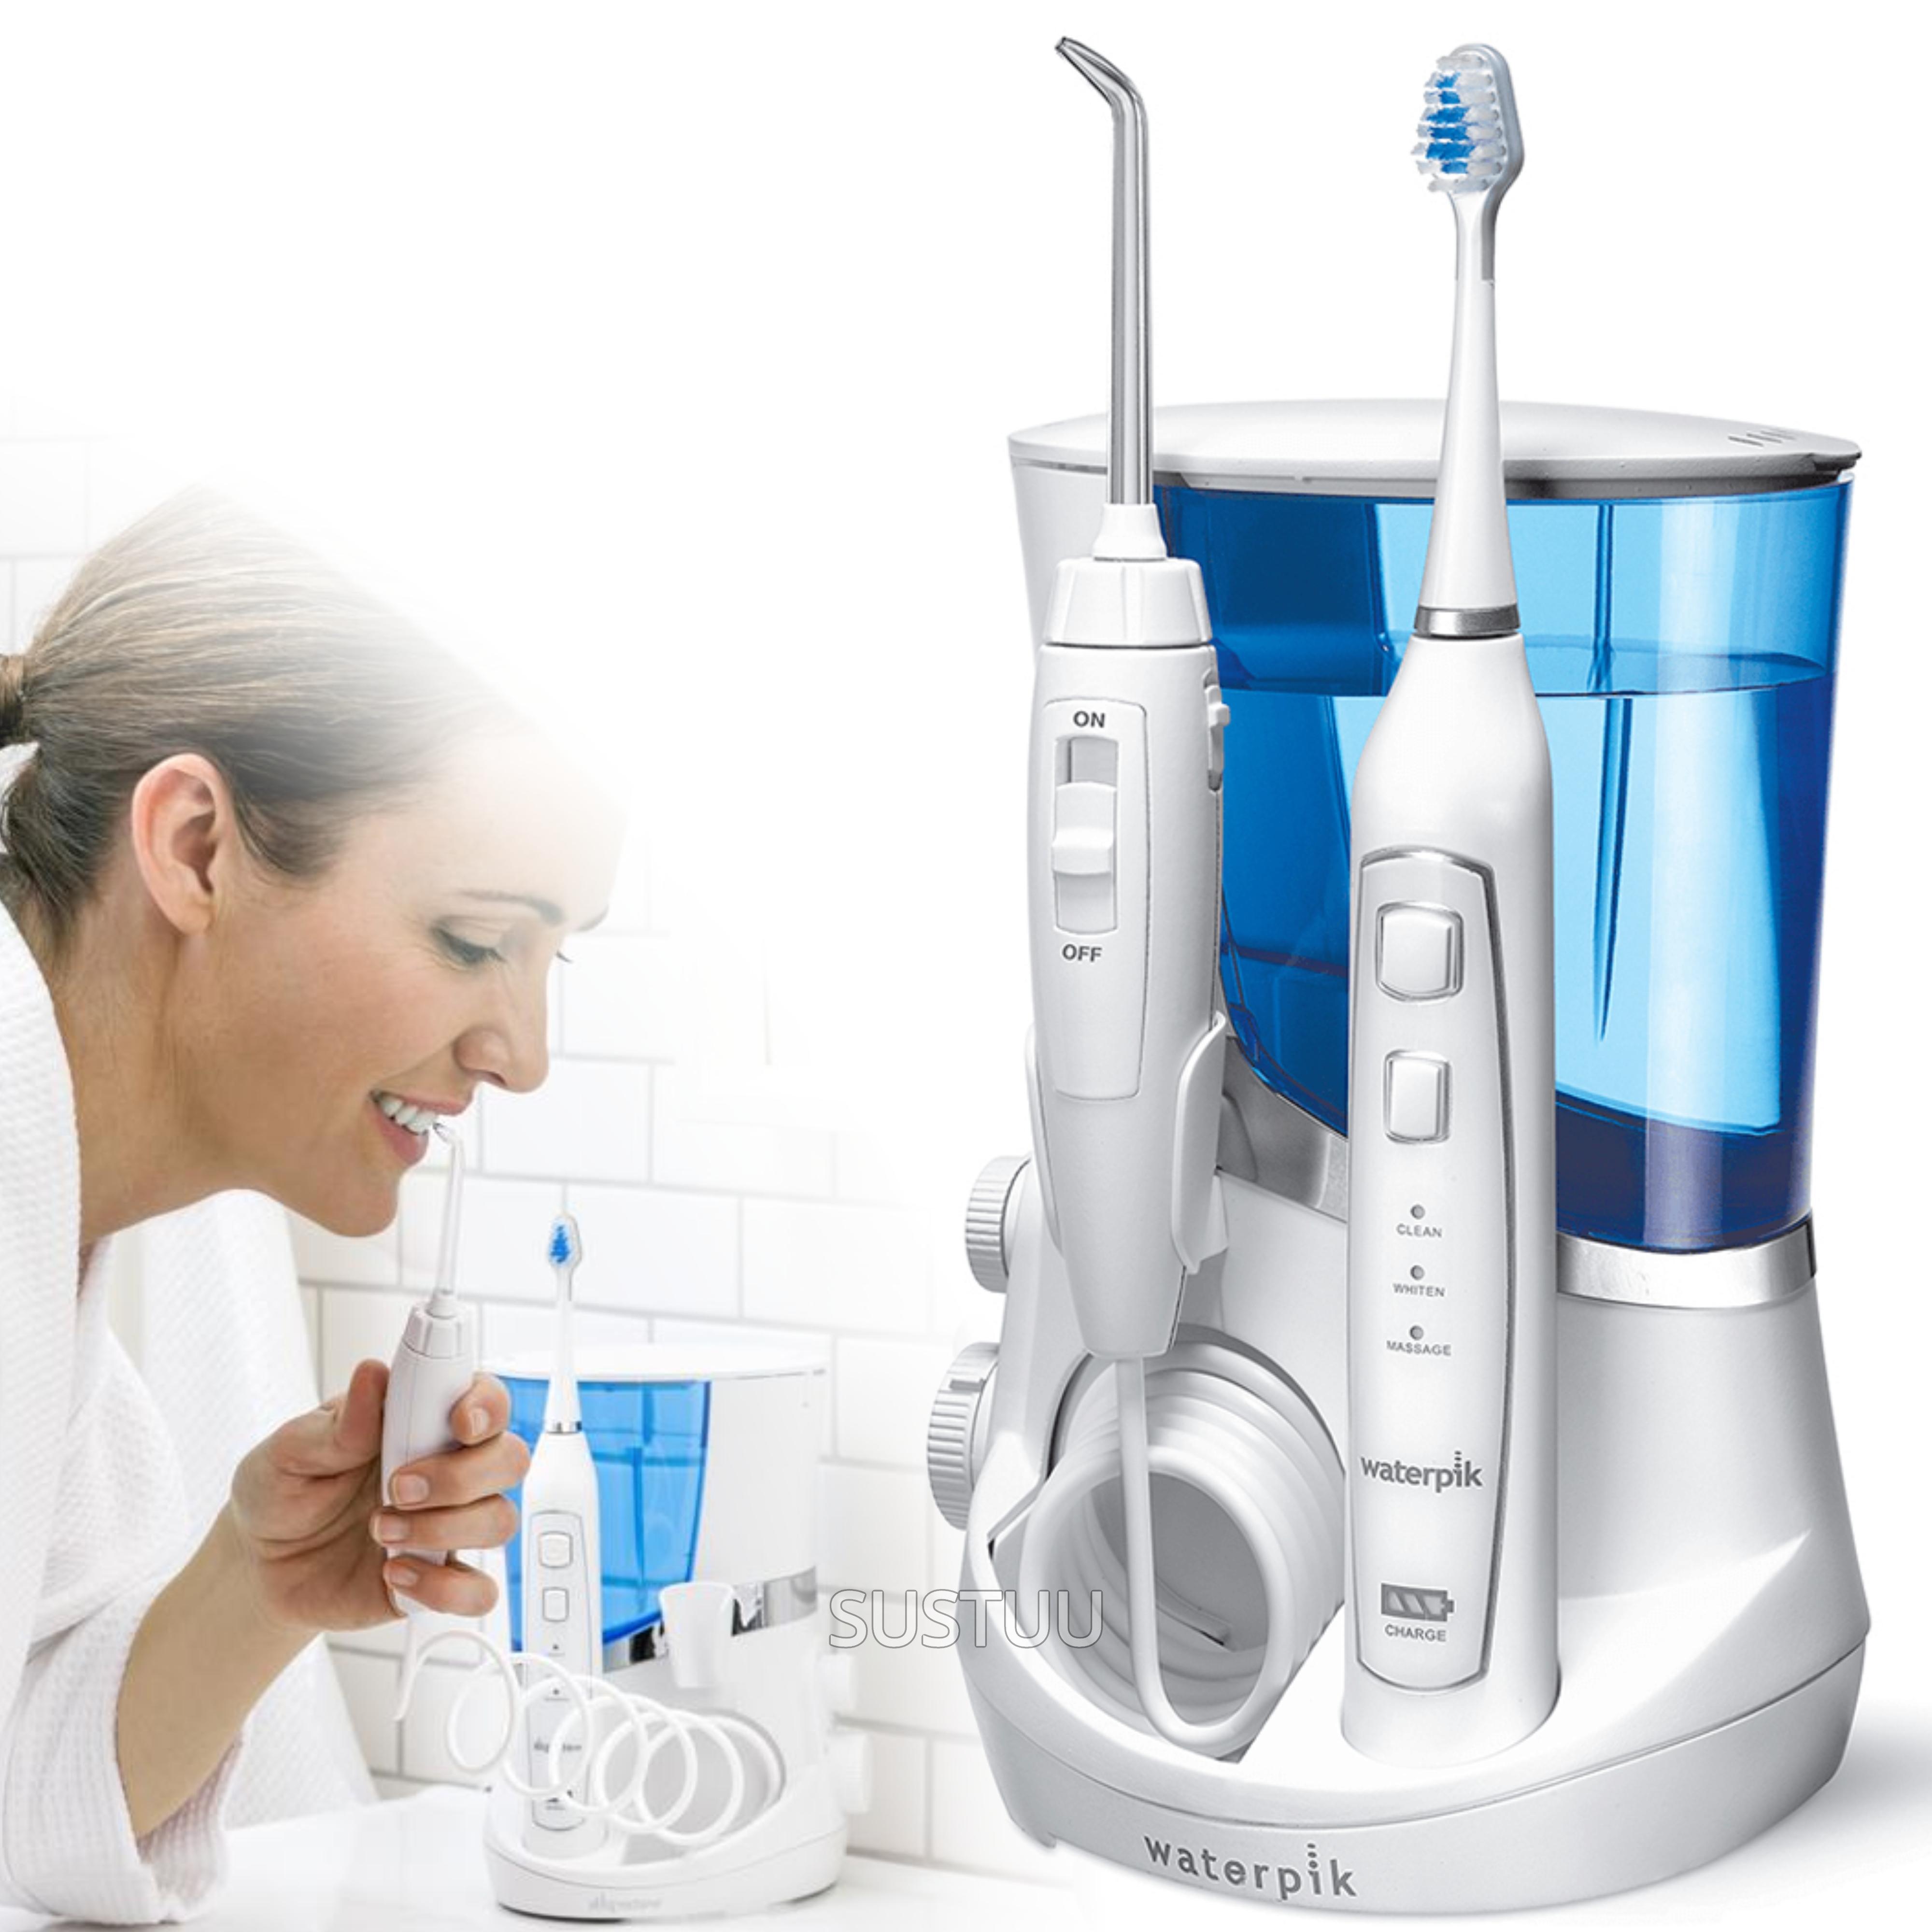 Waterpik Complete Care 5.0 (Combo) | Water Flosser Irrigator + Sonic Toothbrush | WP861